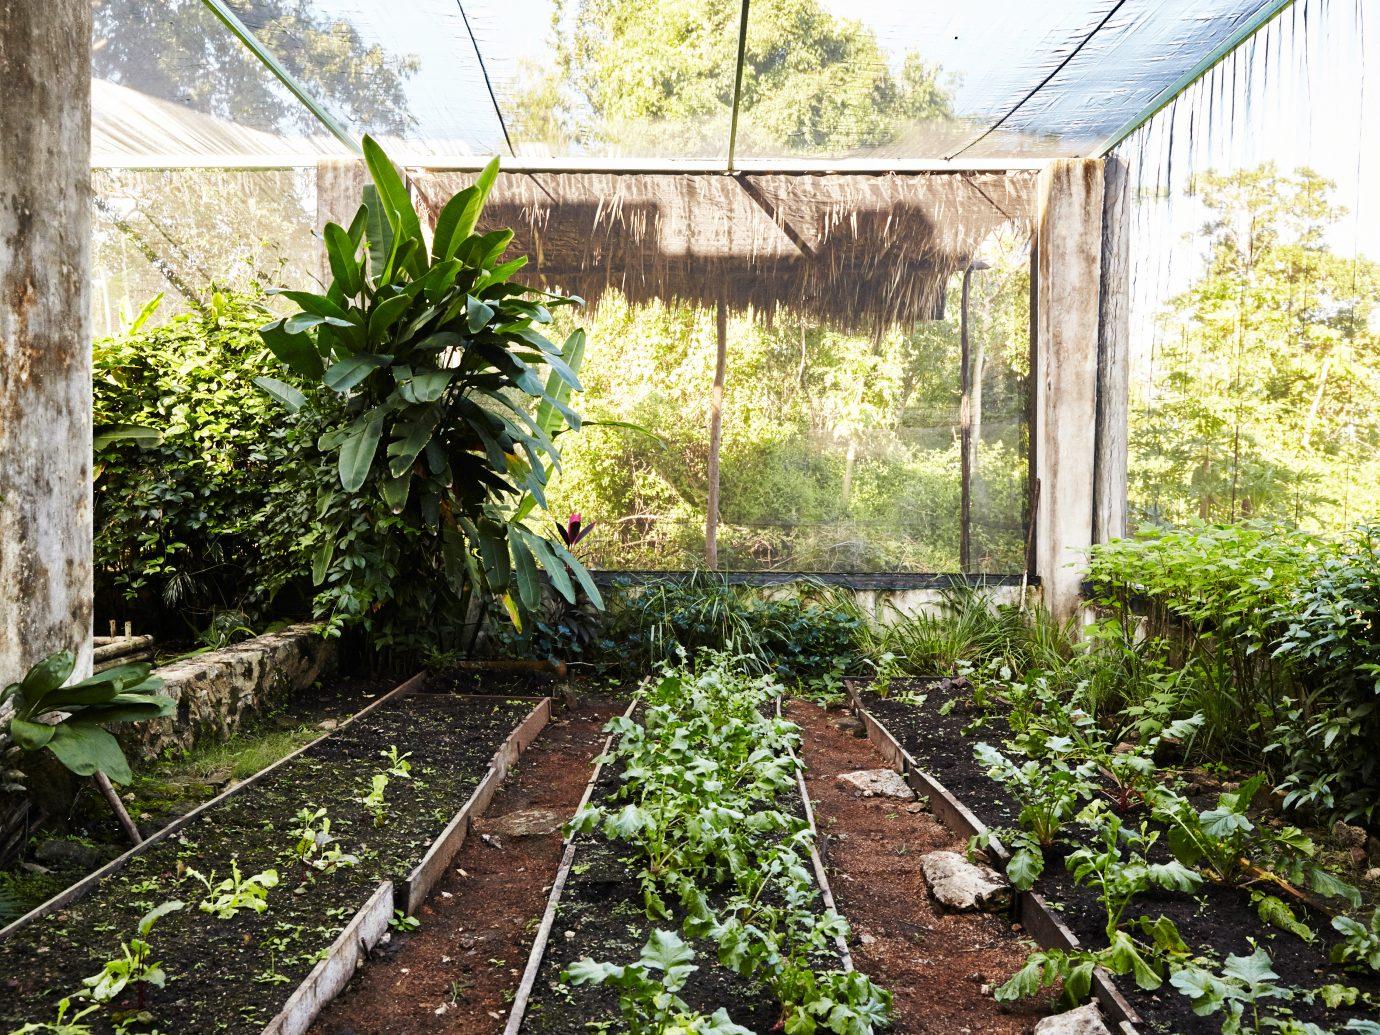 Plants growing at Coqui Coqui, Merida